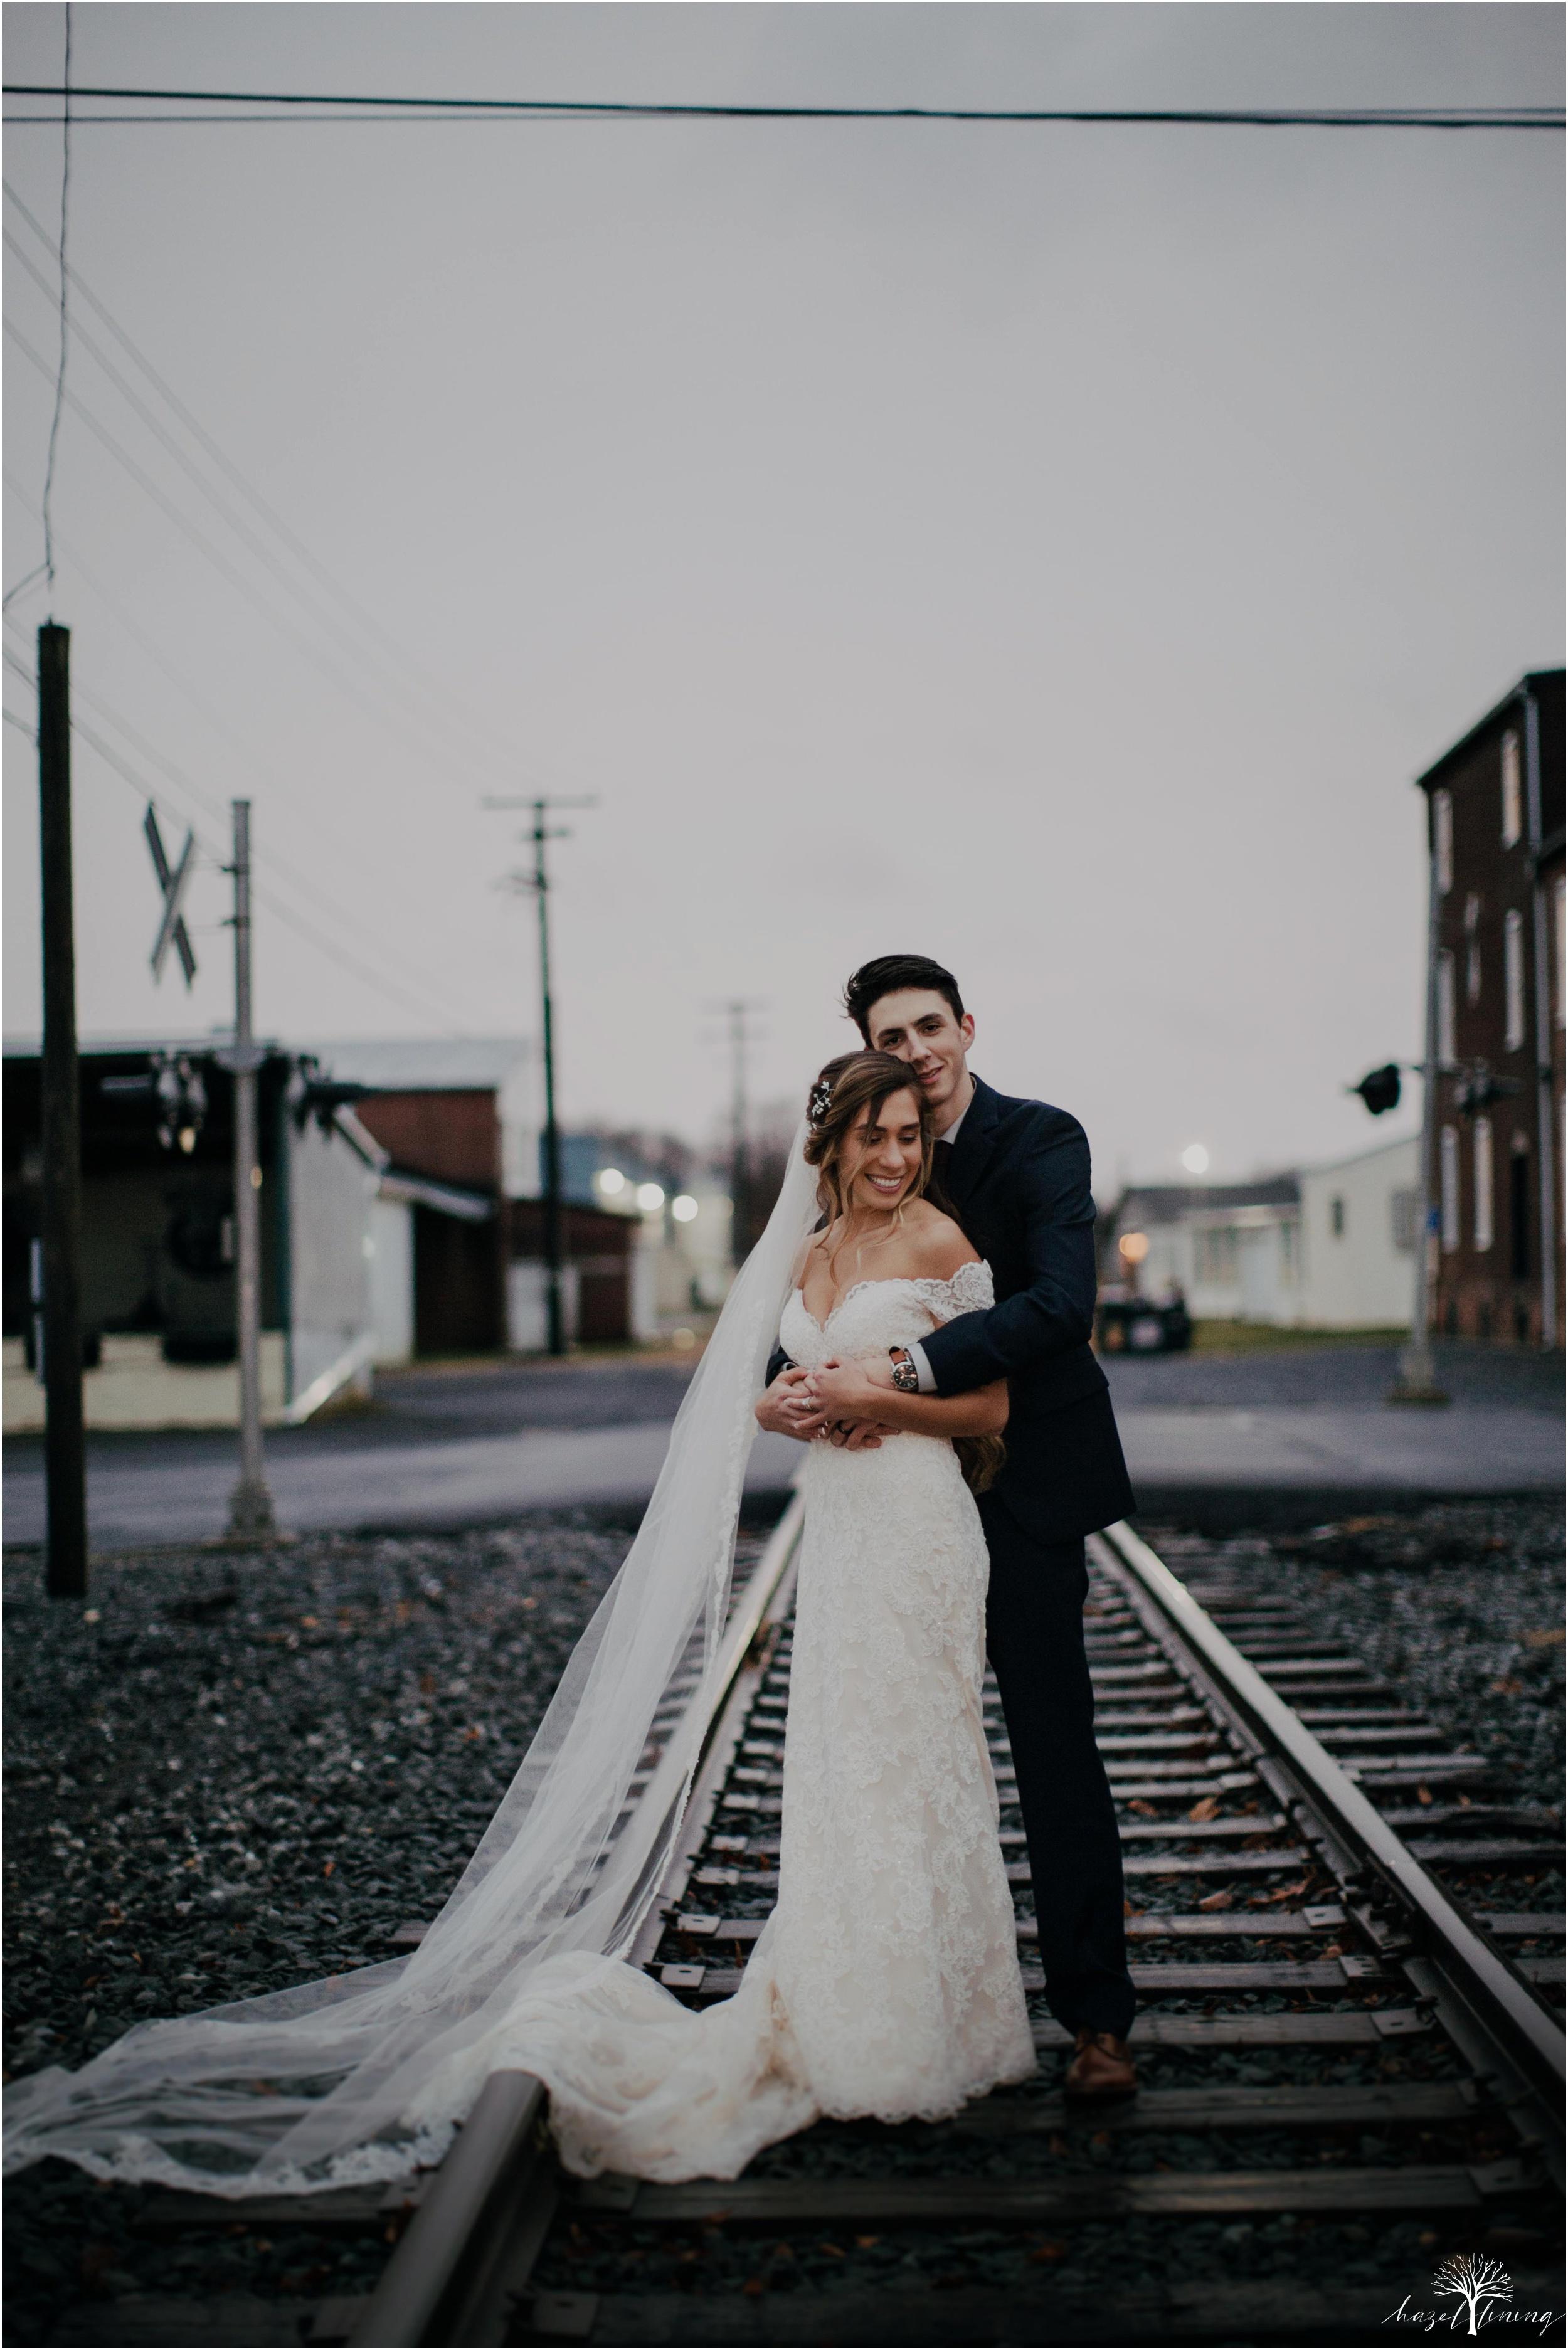 emma-matt-gehringer-the-booking-house-lancaster-manhiem-pennsylvania-winter-wedding_0113.jpg